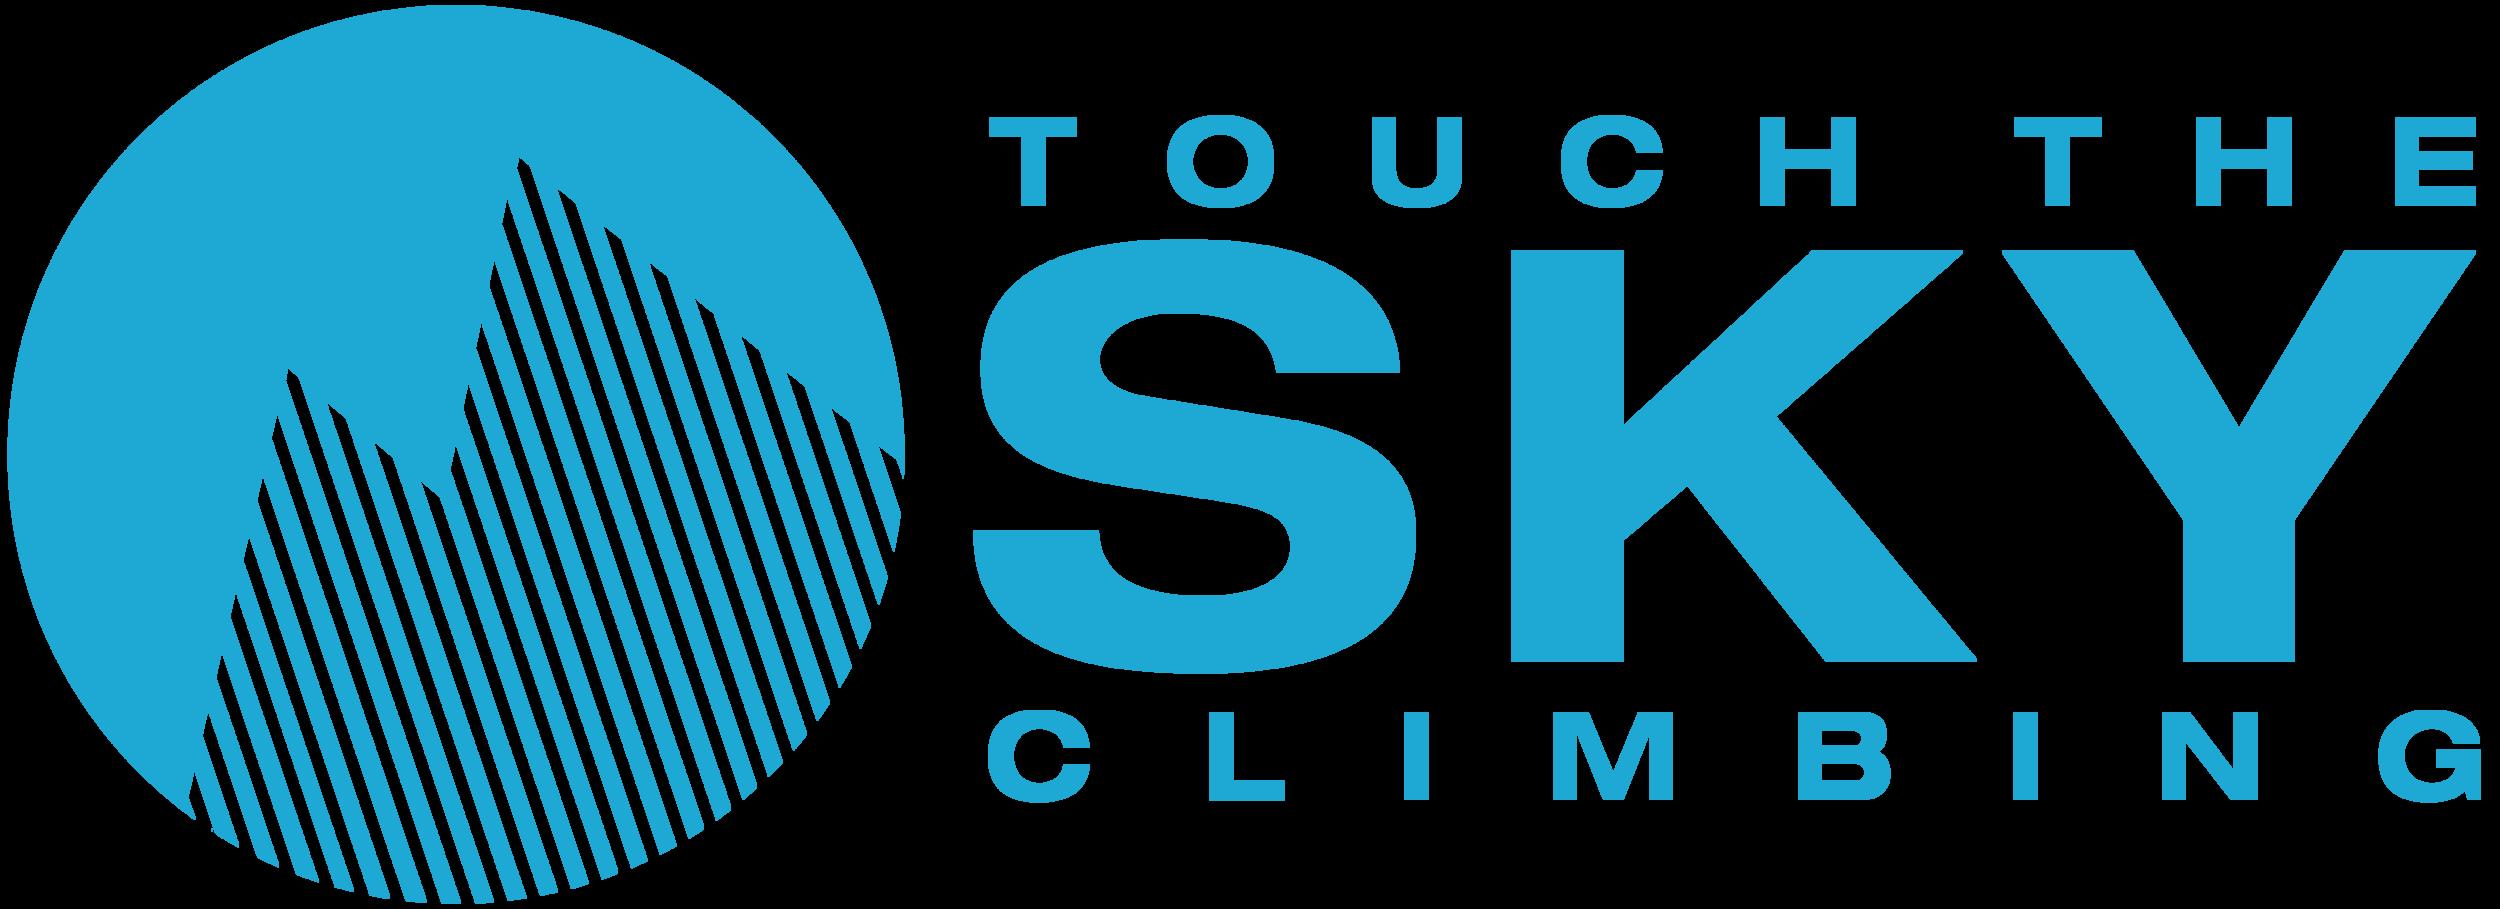 TTS Logo & Text (dark blue).png